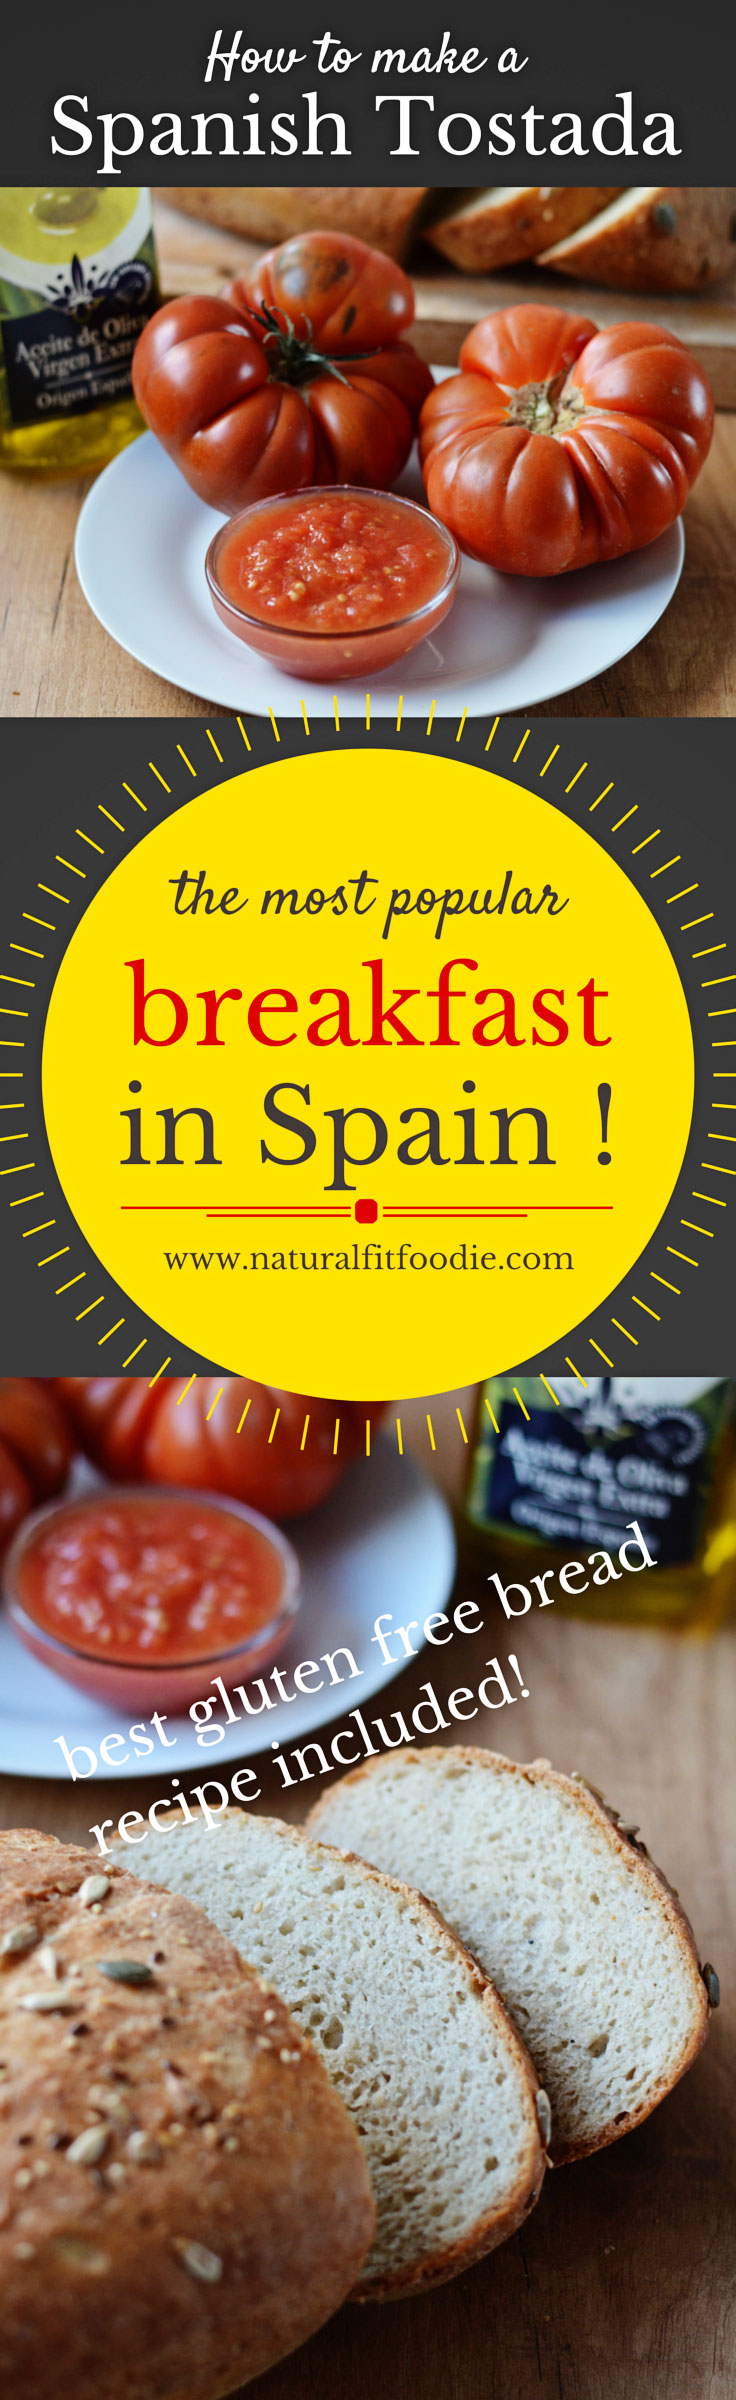 Spanish-Tostada-Pinterest